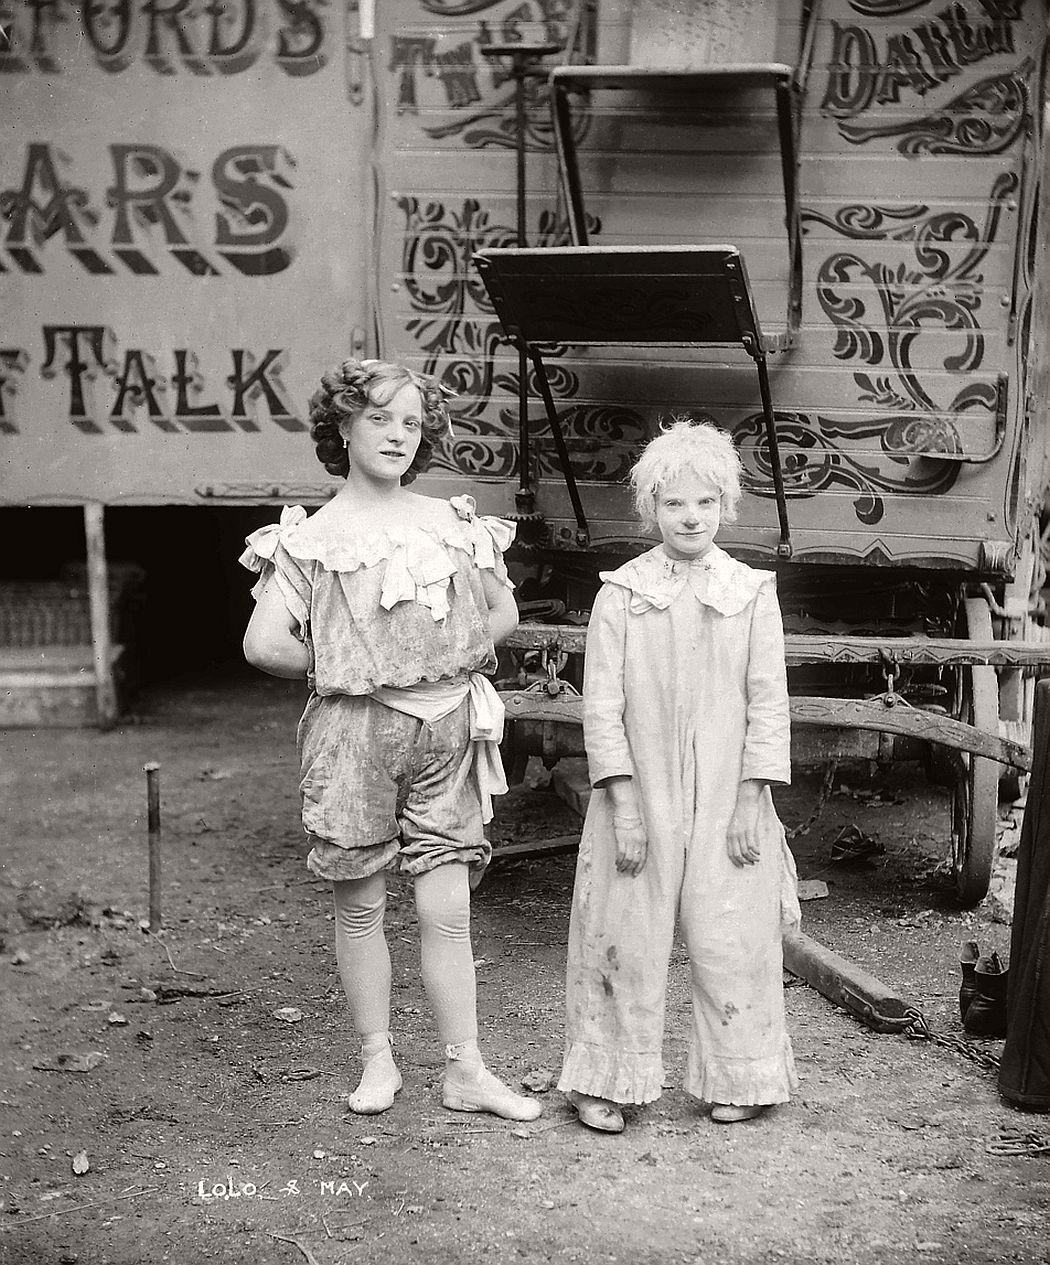 vintage-circus-performers-in-strabane-1910-1911-18